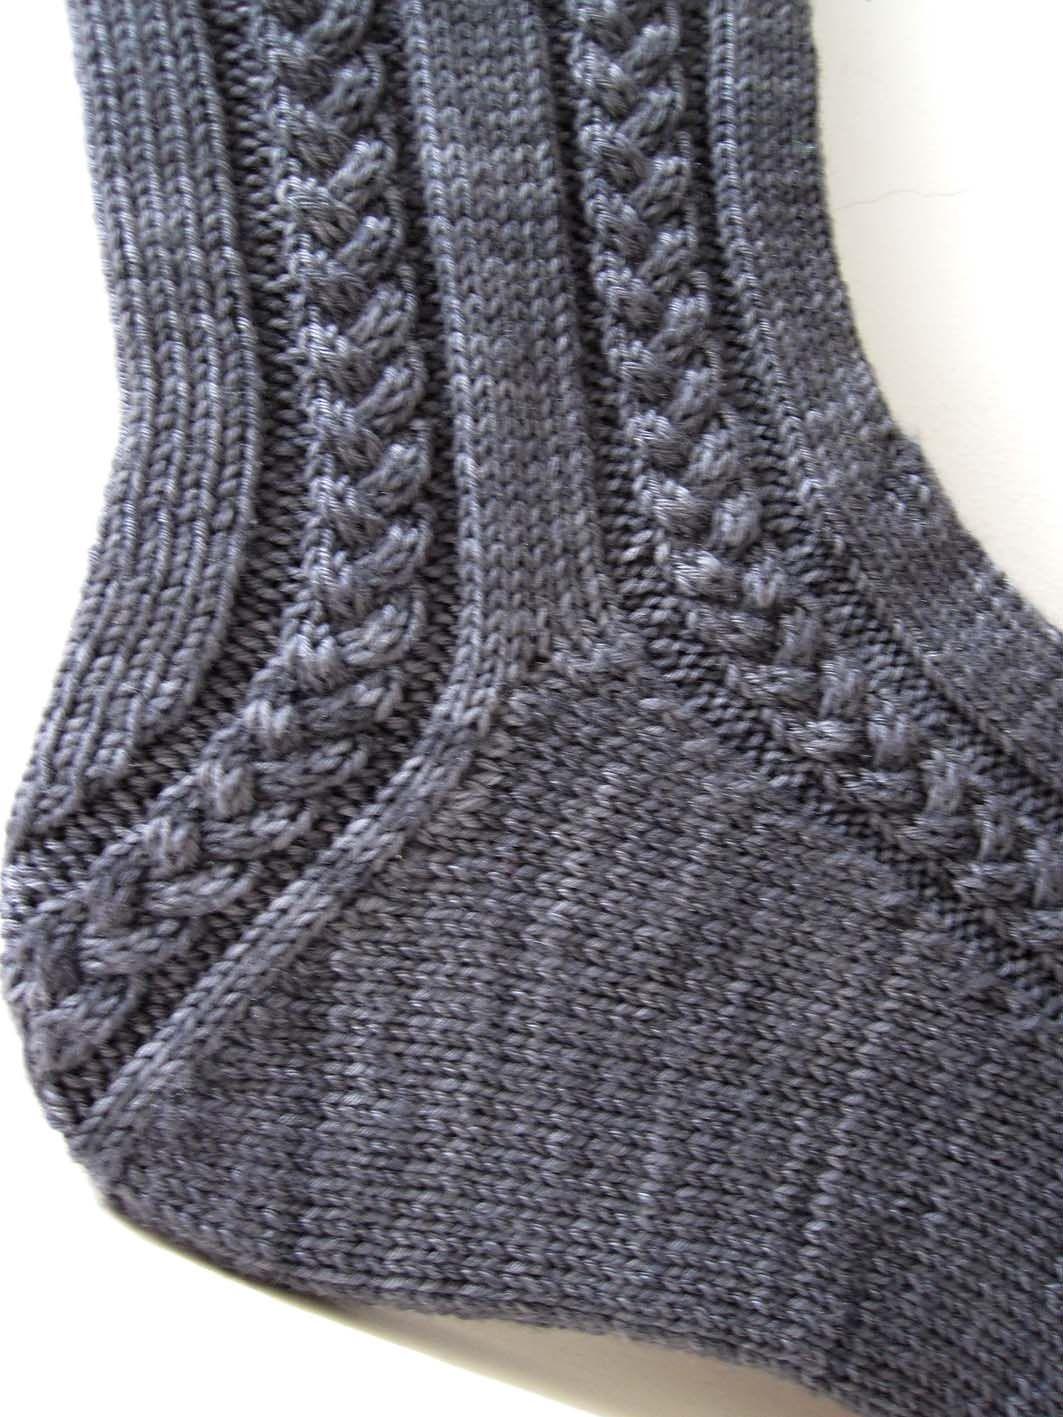 Ravelry Maudie by General Hogbuffer Socken stricken